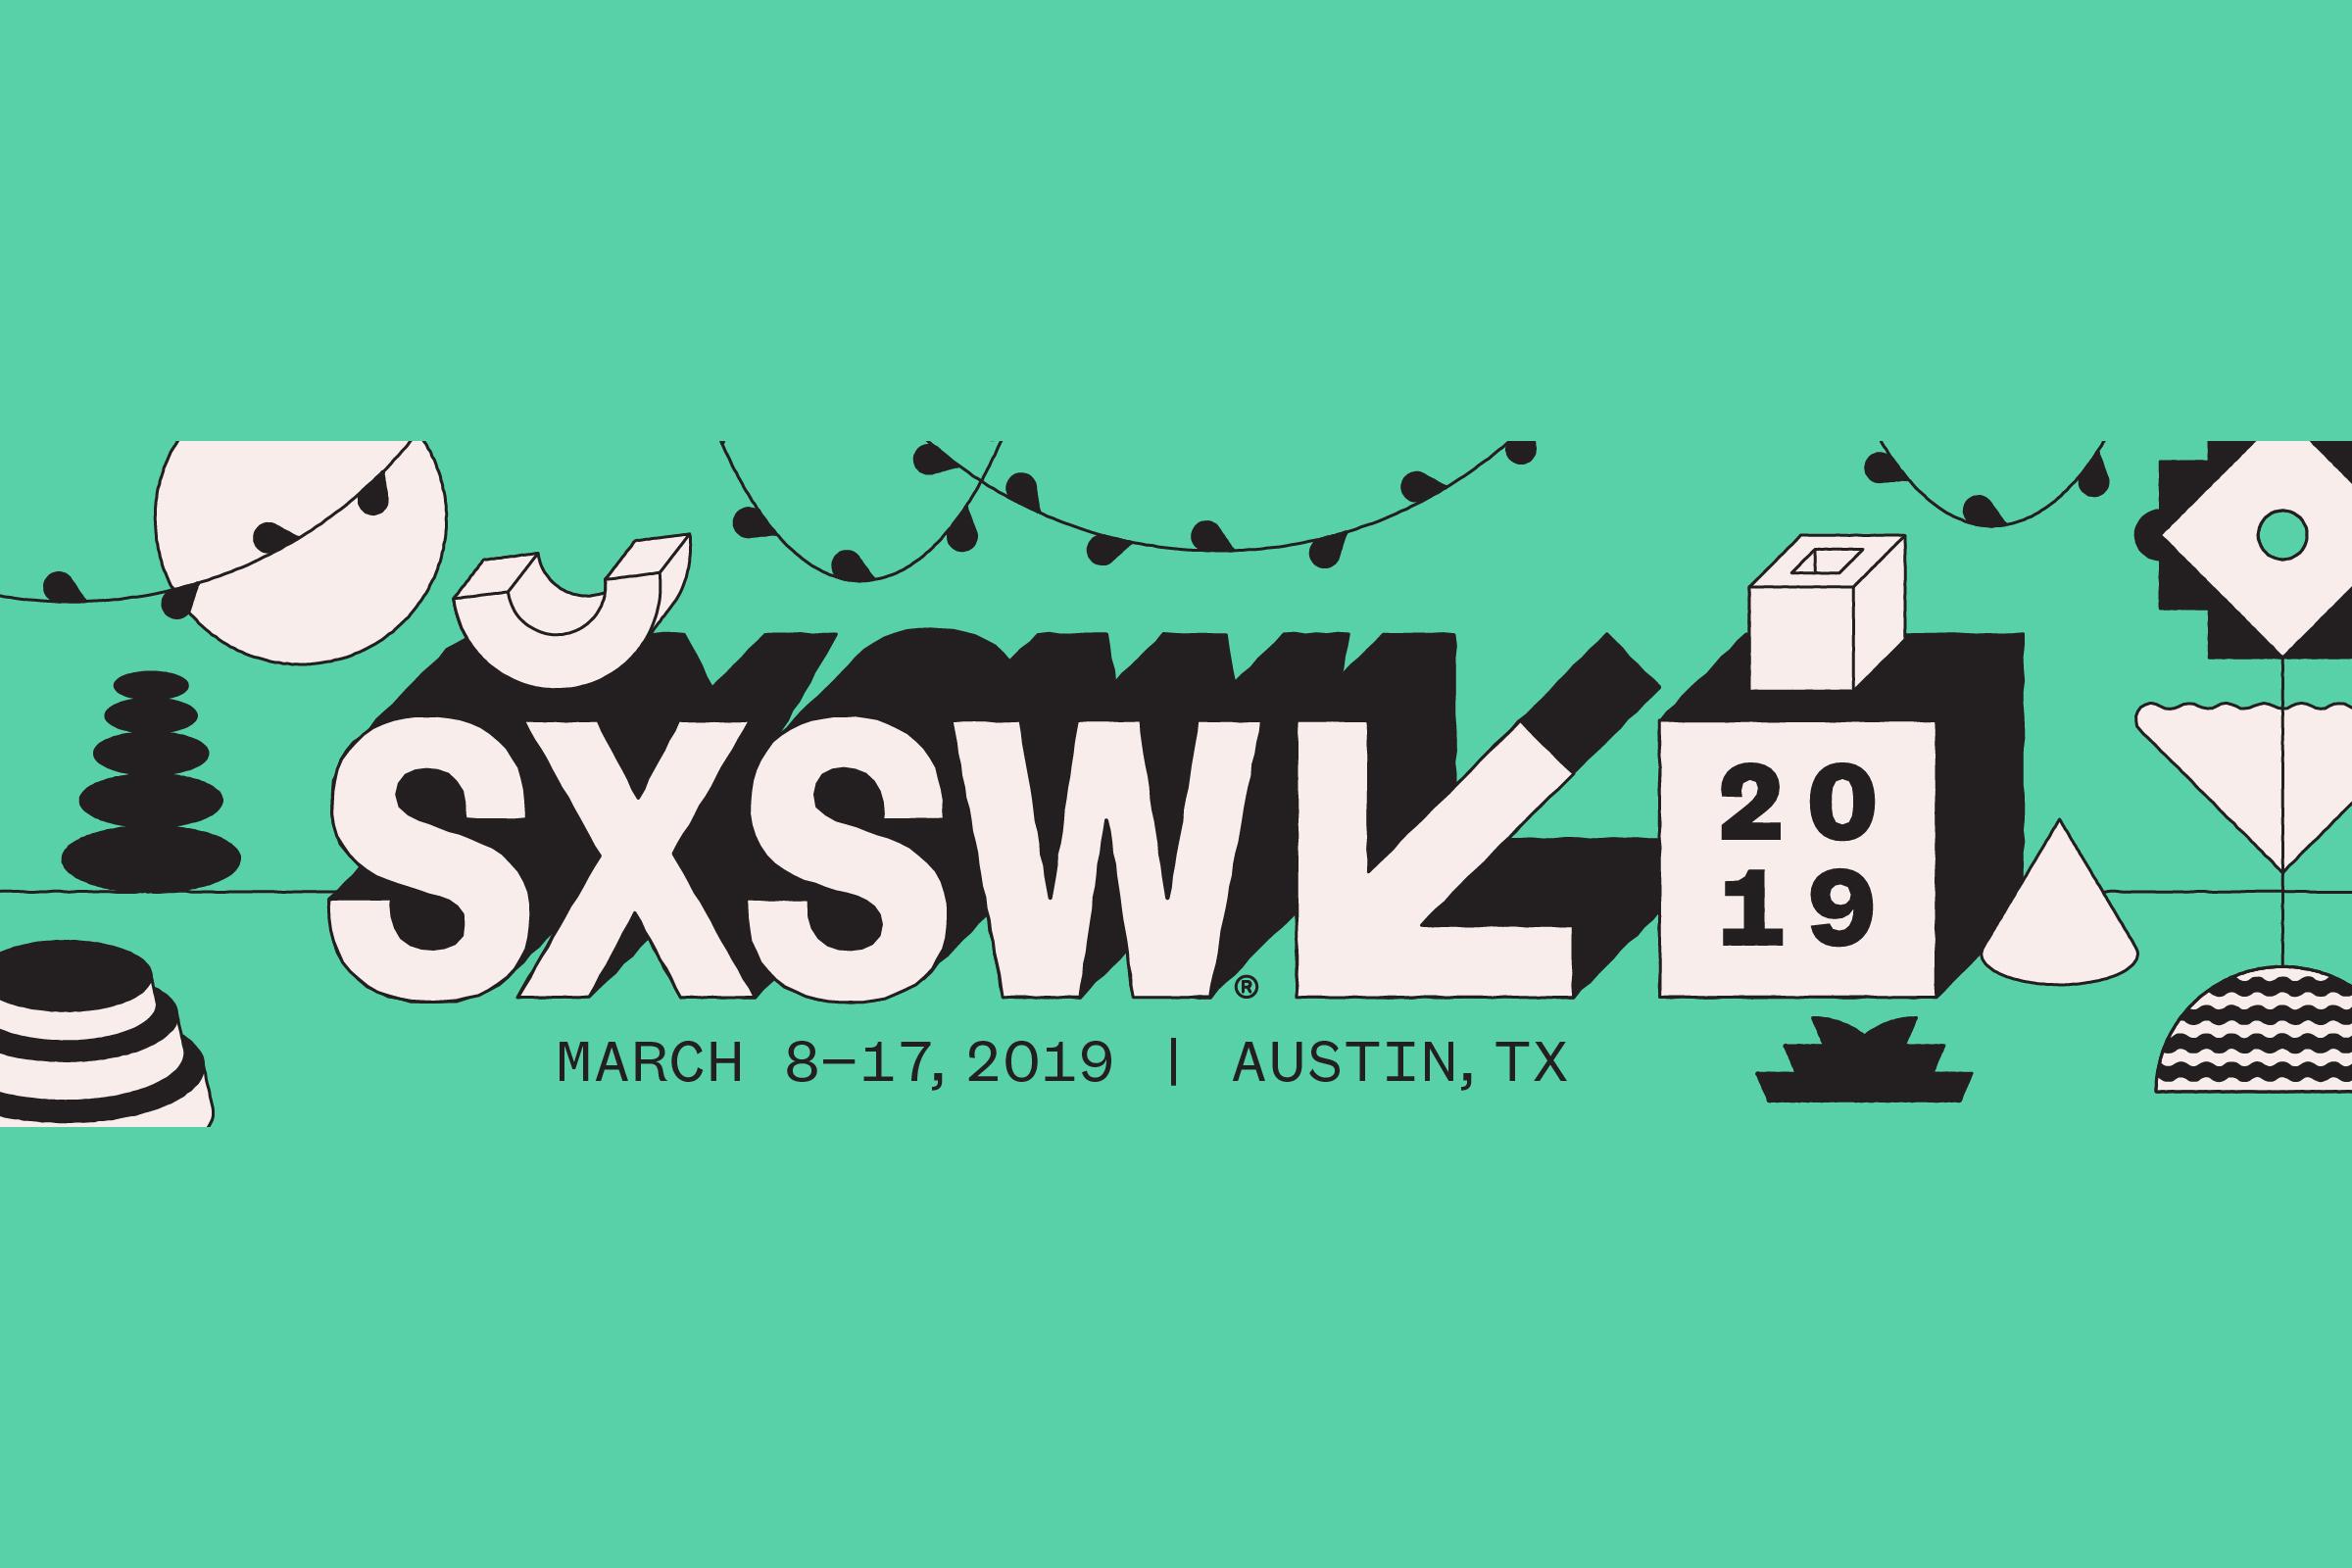 SXSW-2019-Logo-Ratio.jpg